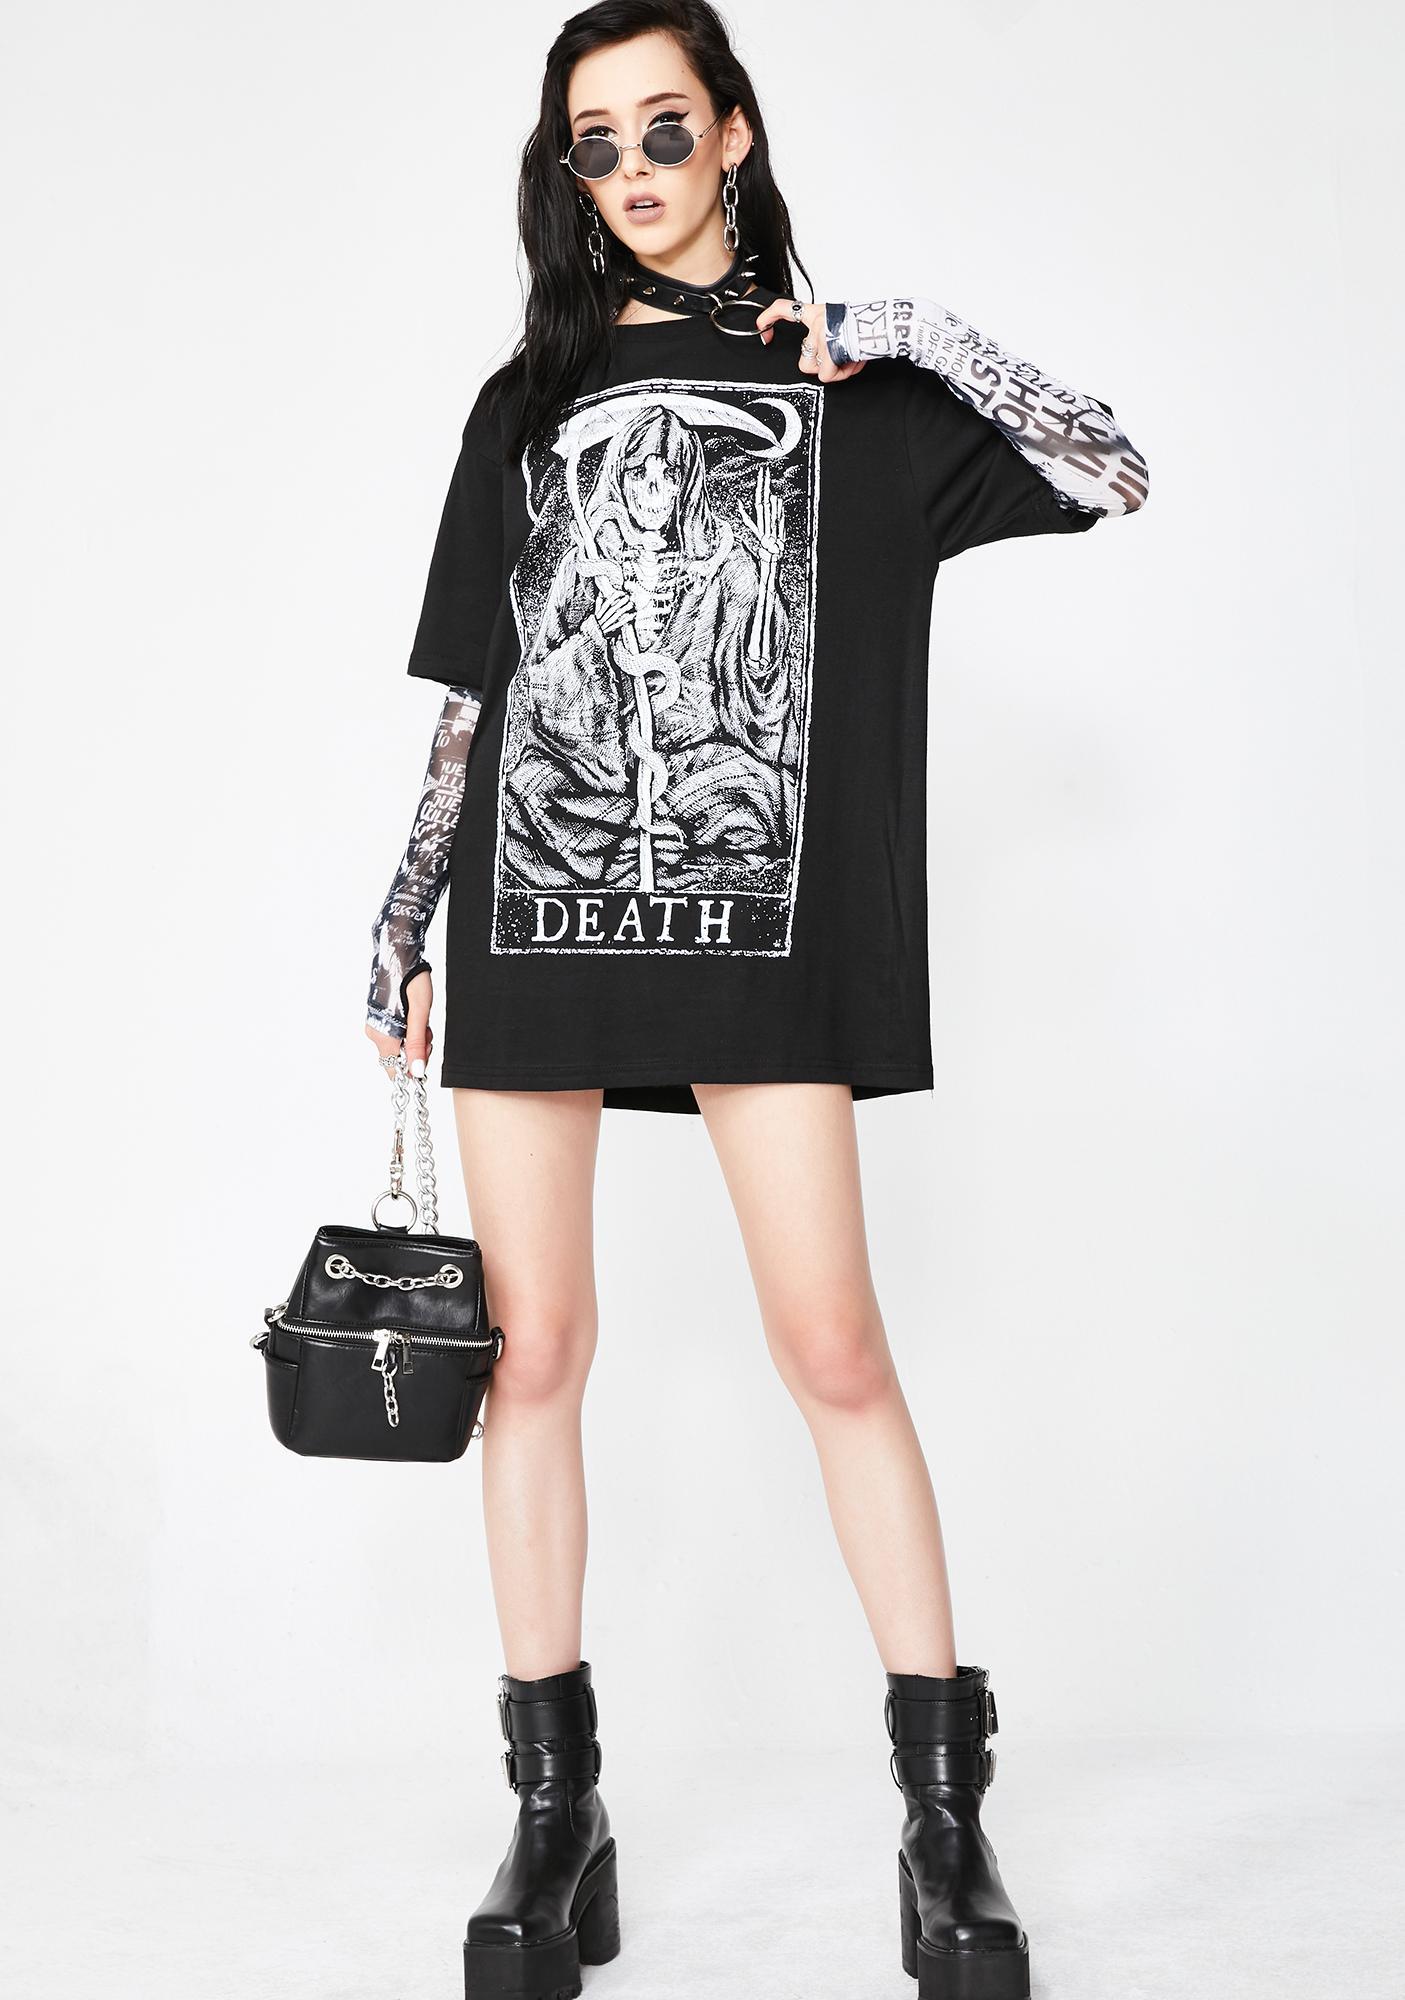 Mortus Viventi Death T-Shirt